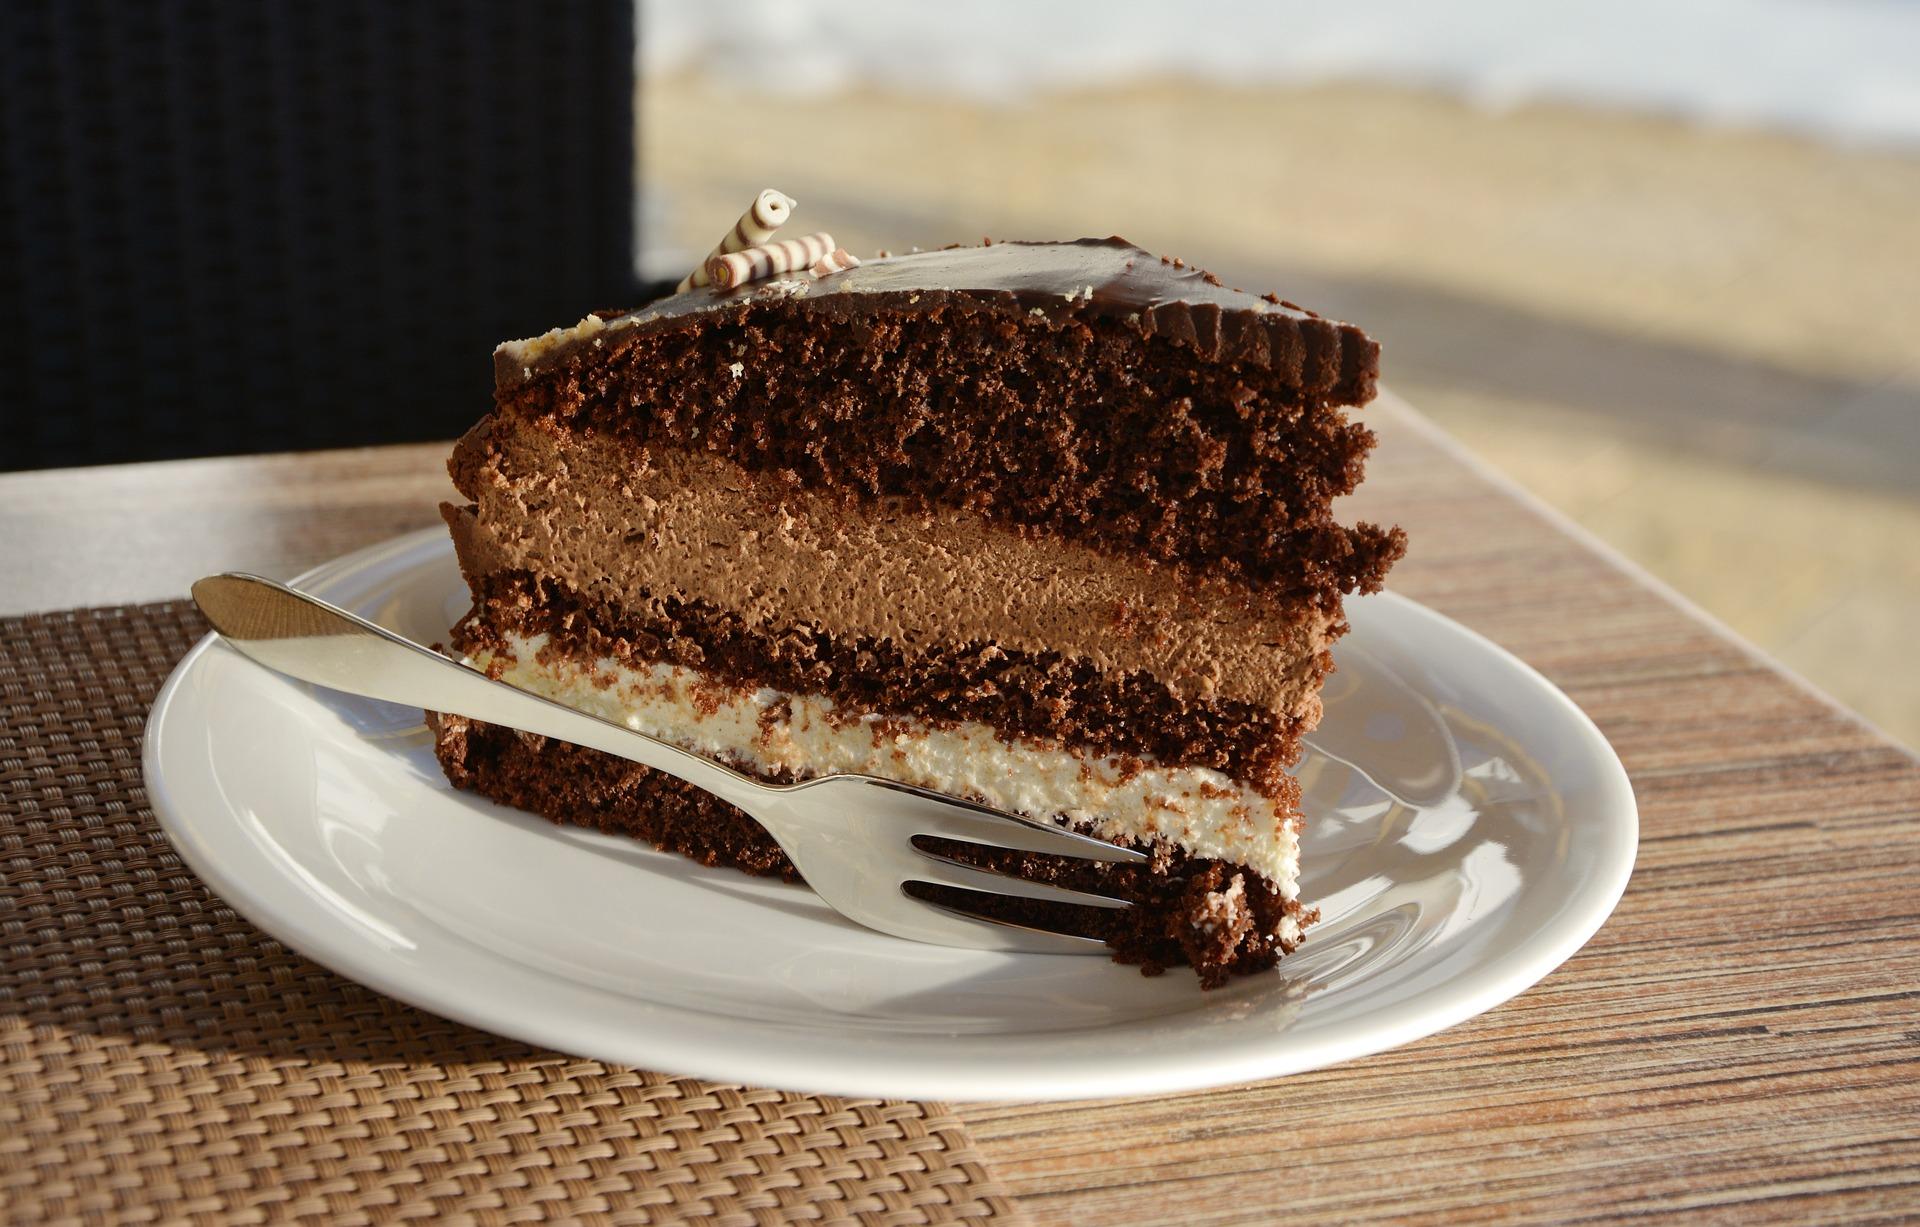 schokolade1 - Süßes